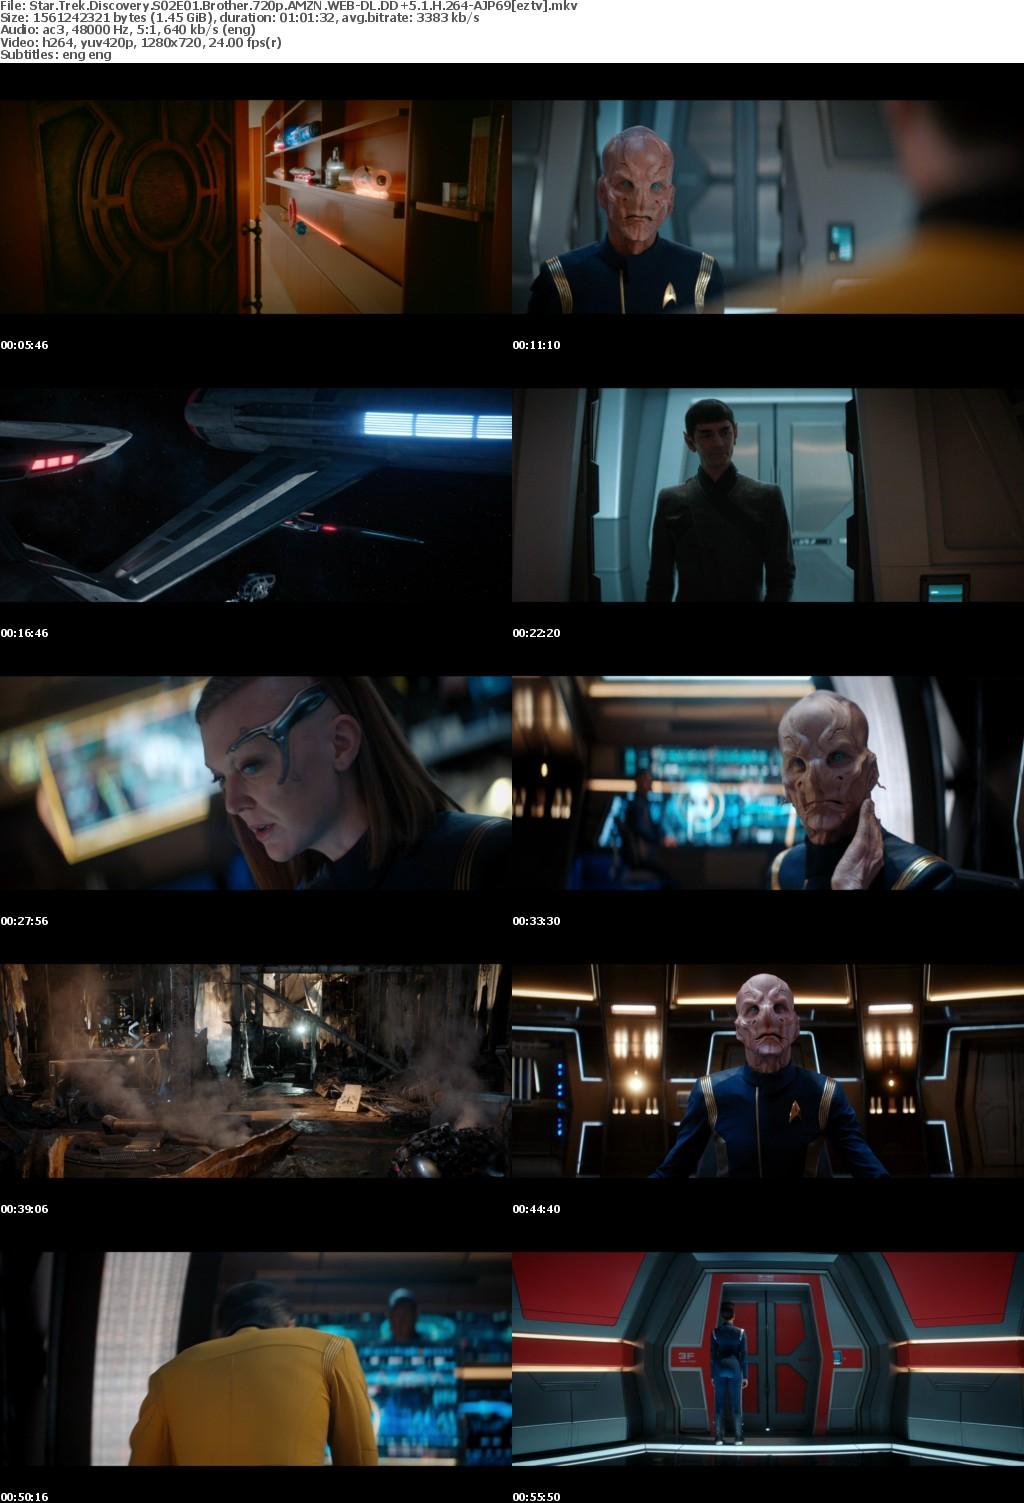 Star Trek Discovery S02E01 Brother 720p AMZN WEB-DL DD+5.1 H264-AJP69